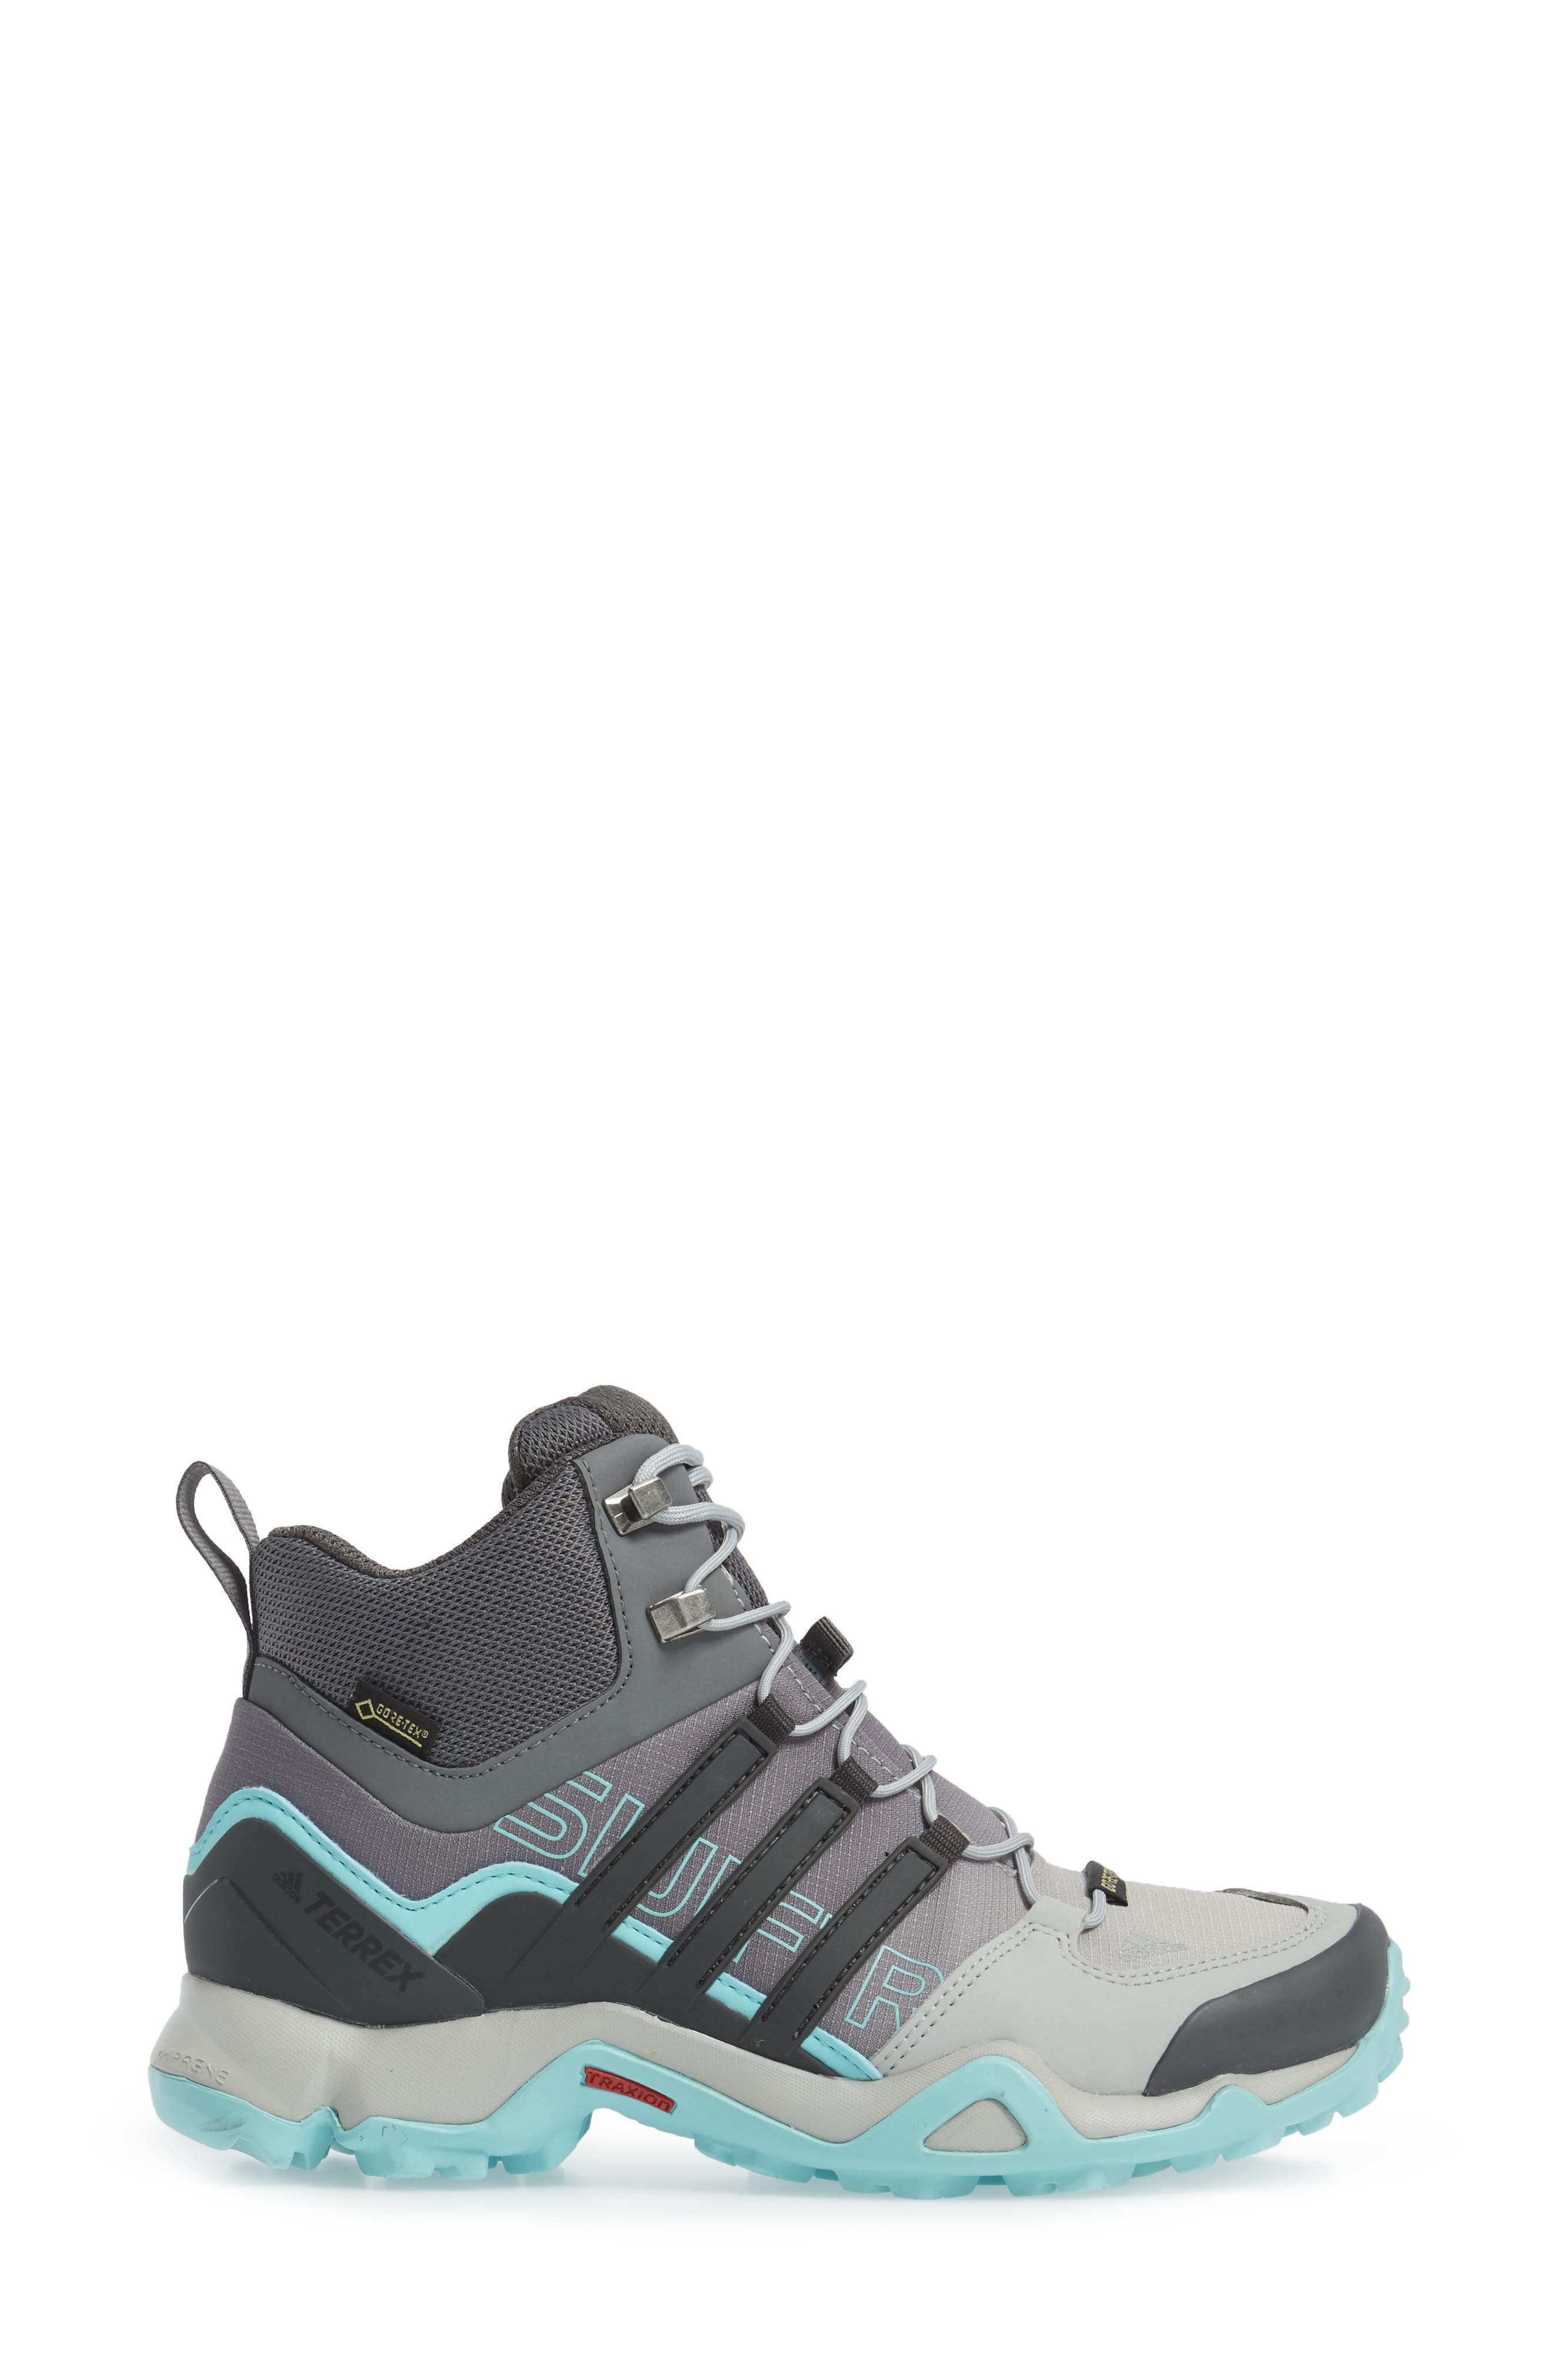 Terrex Swift R GTX Mid Hiking Boot,                             Alternate thumbnail 3, color,                             020